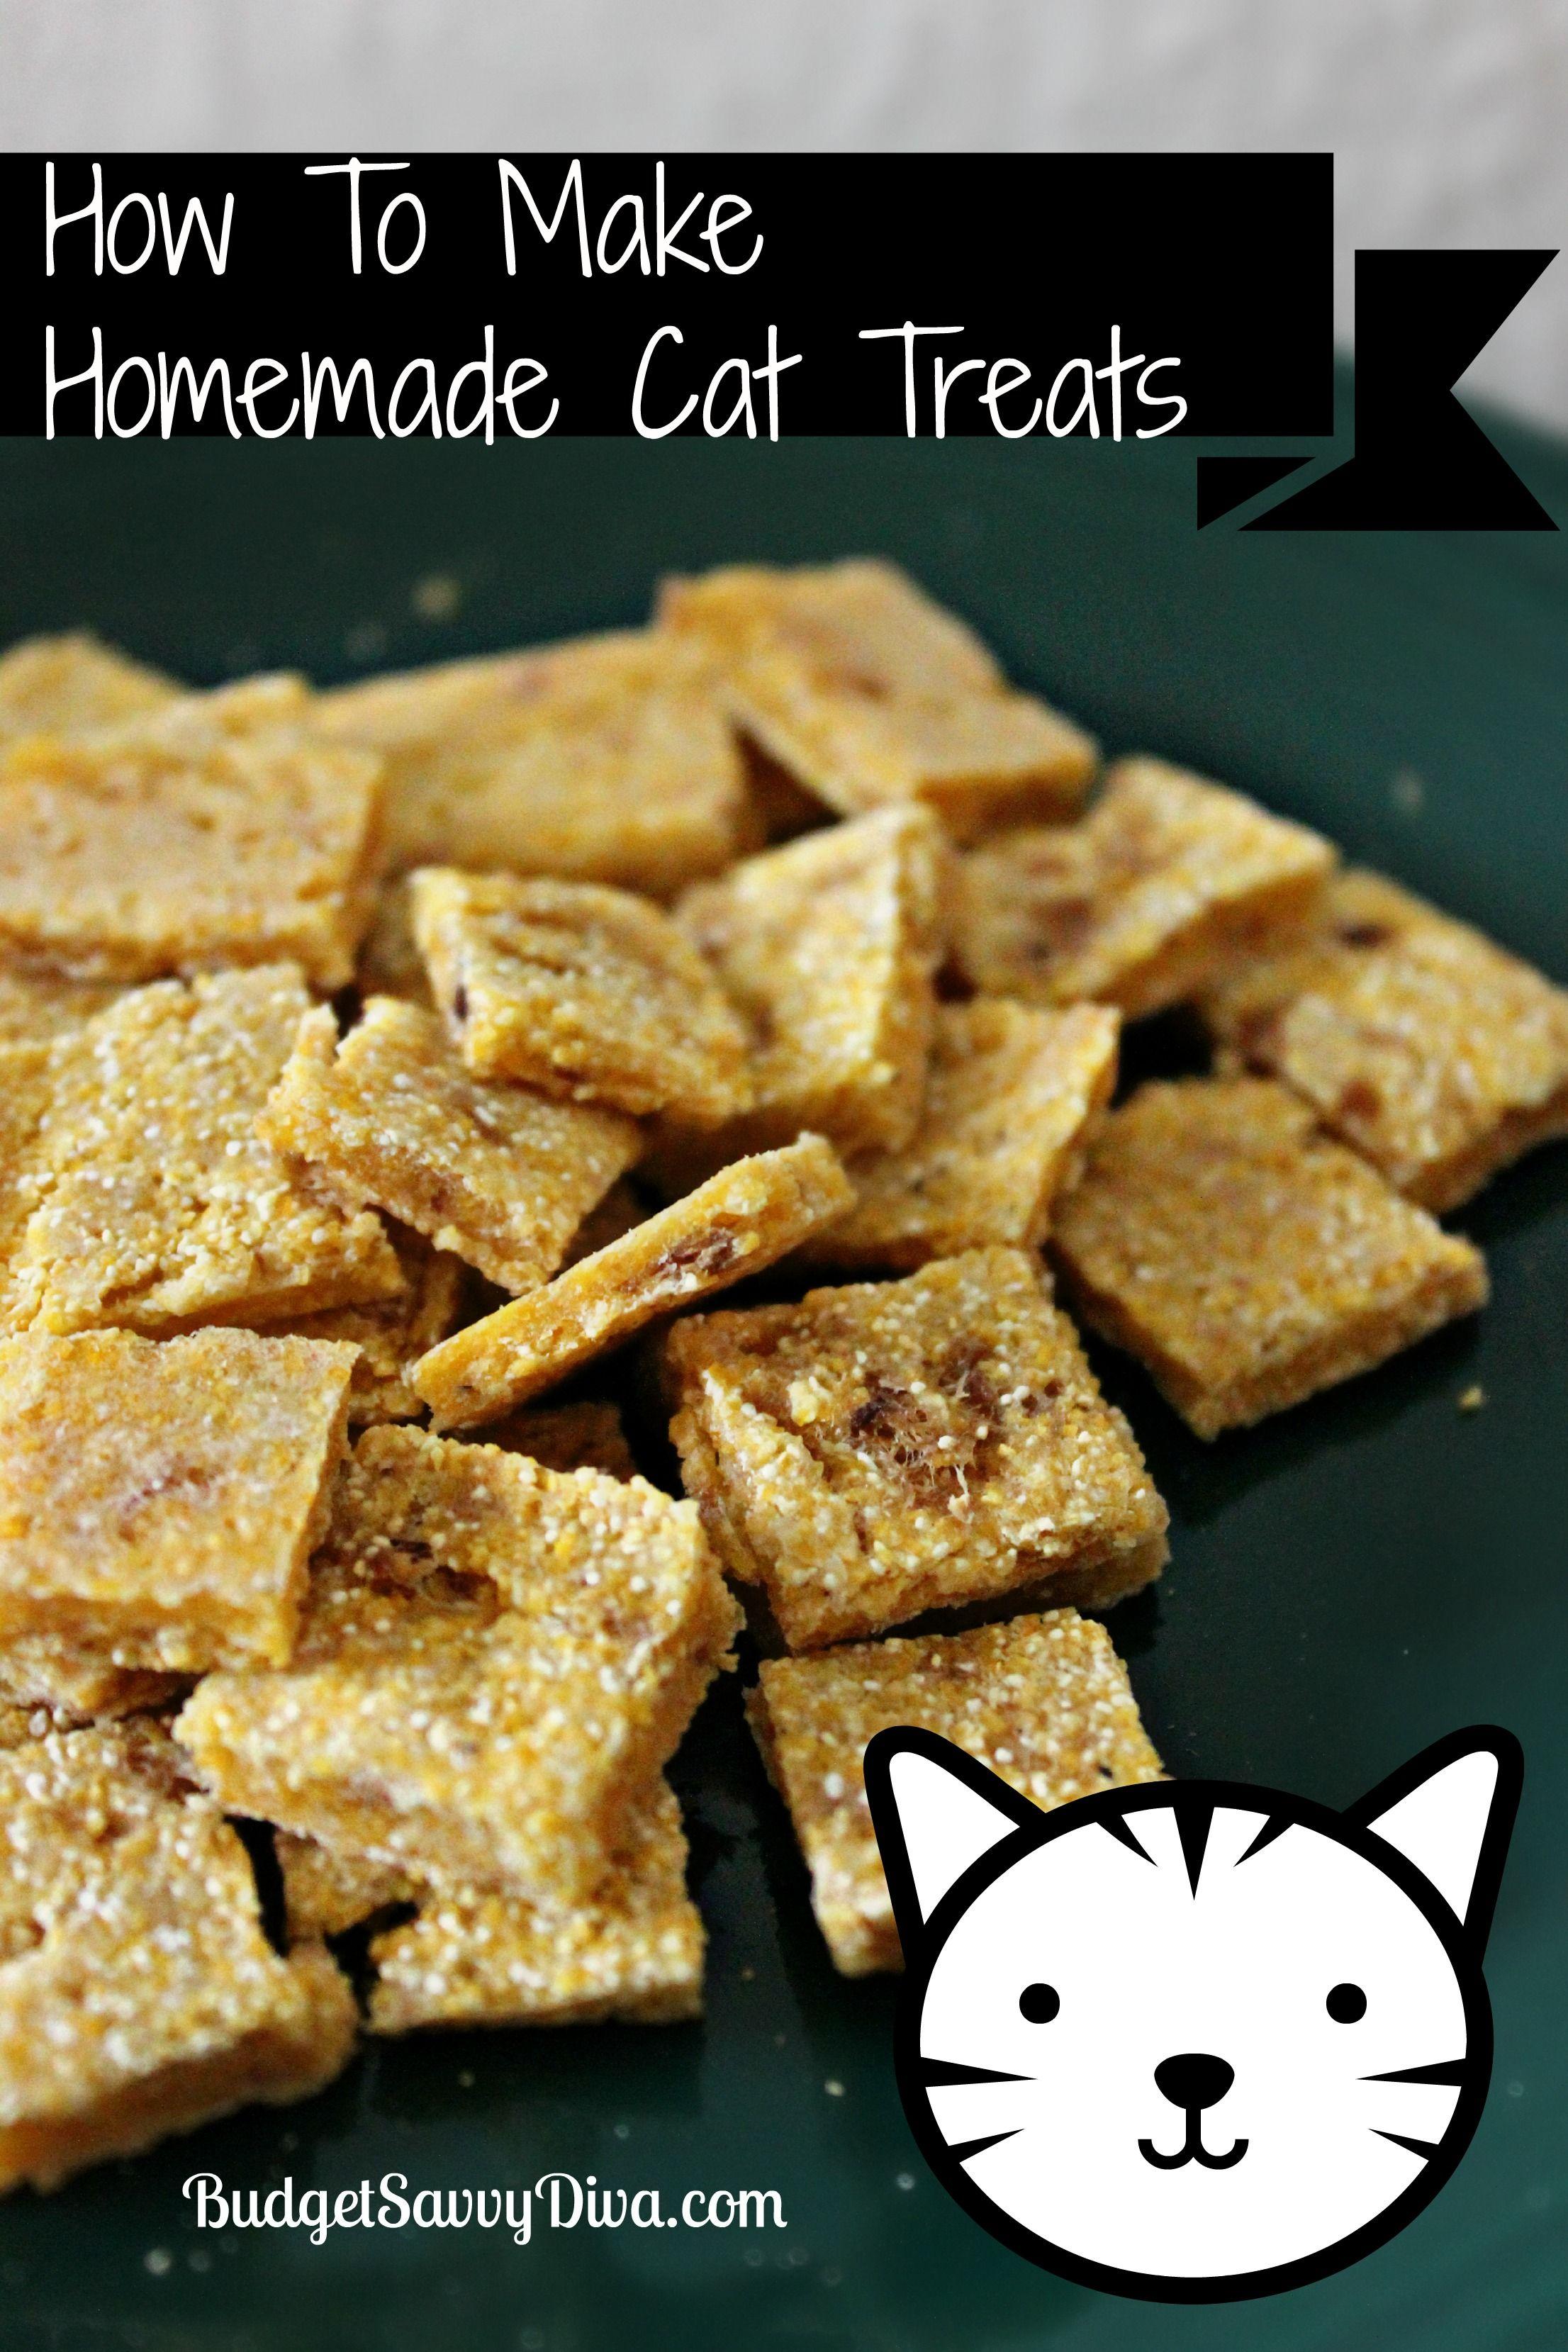 How To Made Homemade Cat Treats